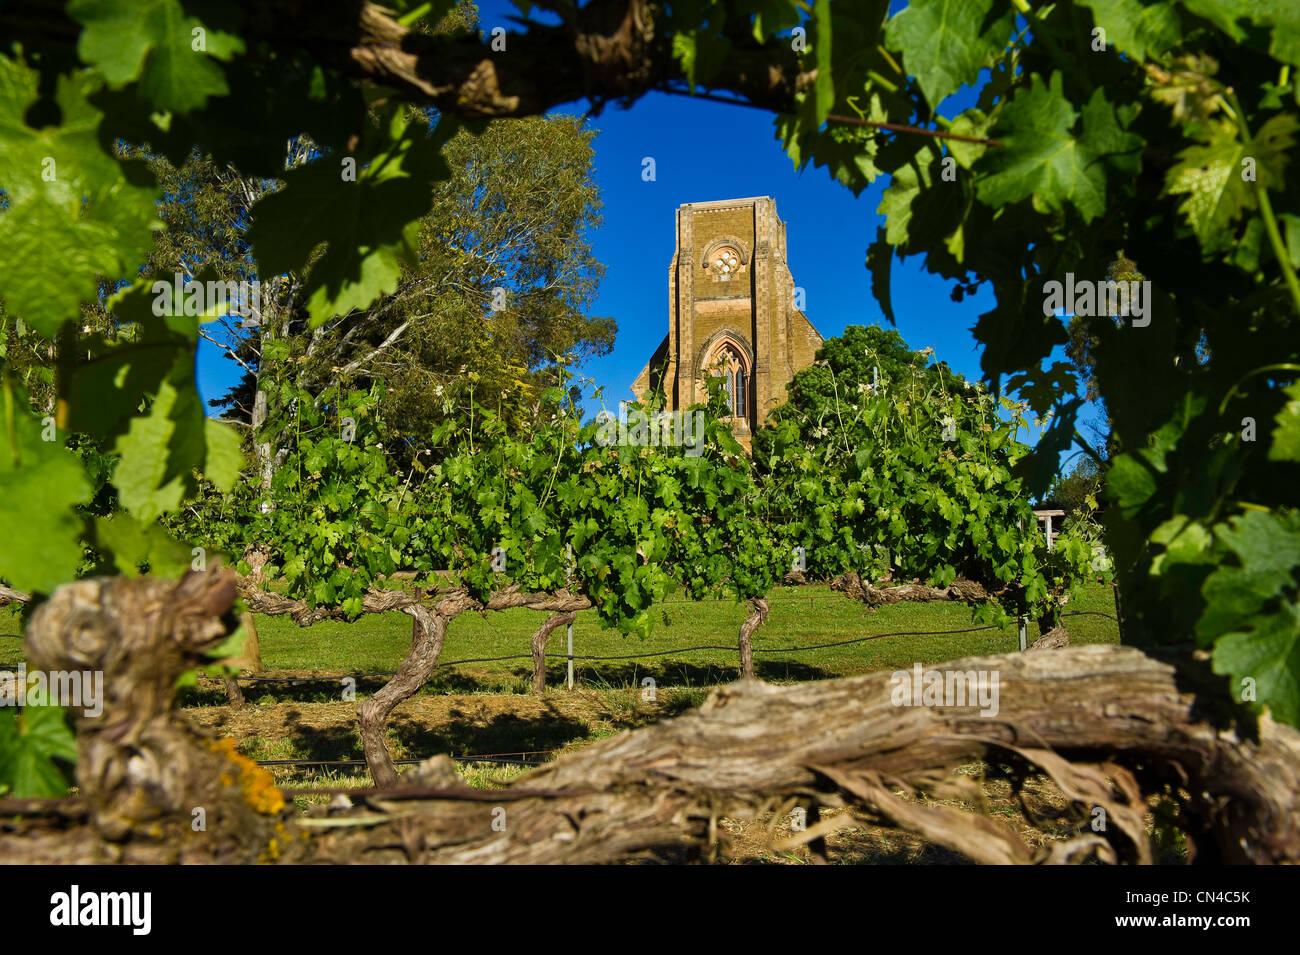 Australia, South Australia, La Clare valley, Seven hills cellar, the oldest cellar in the valley Stock Photo